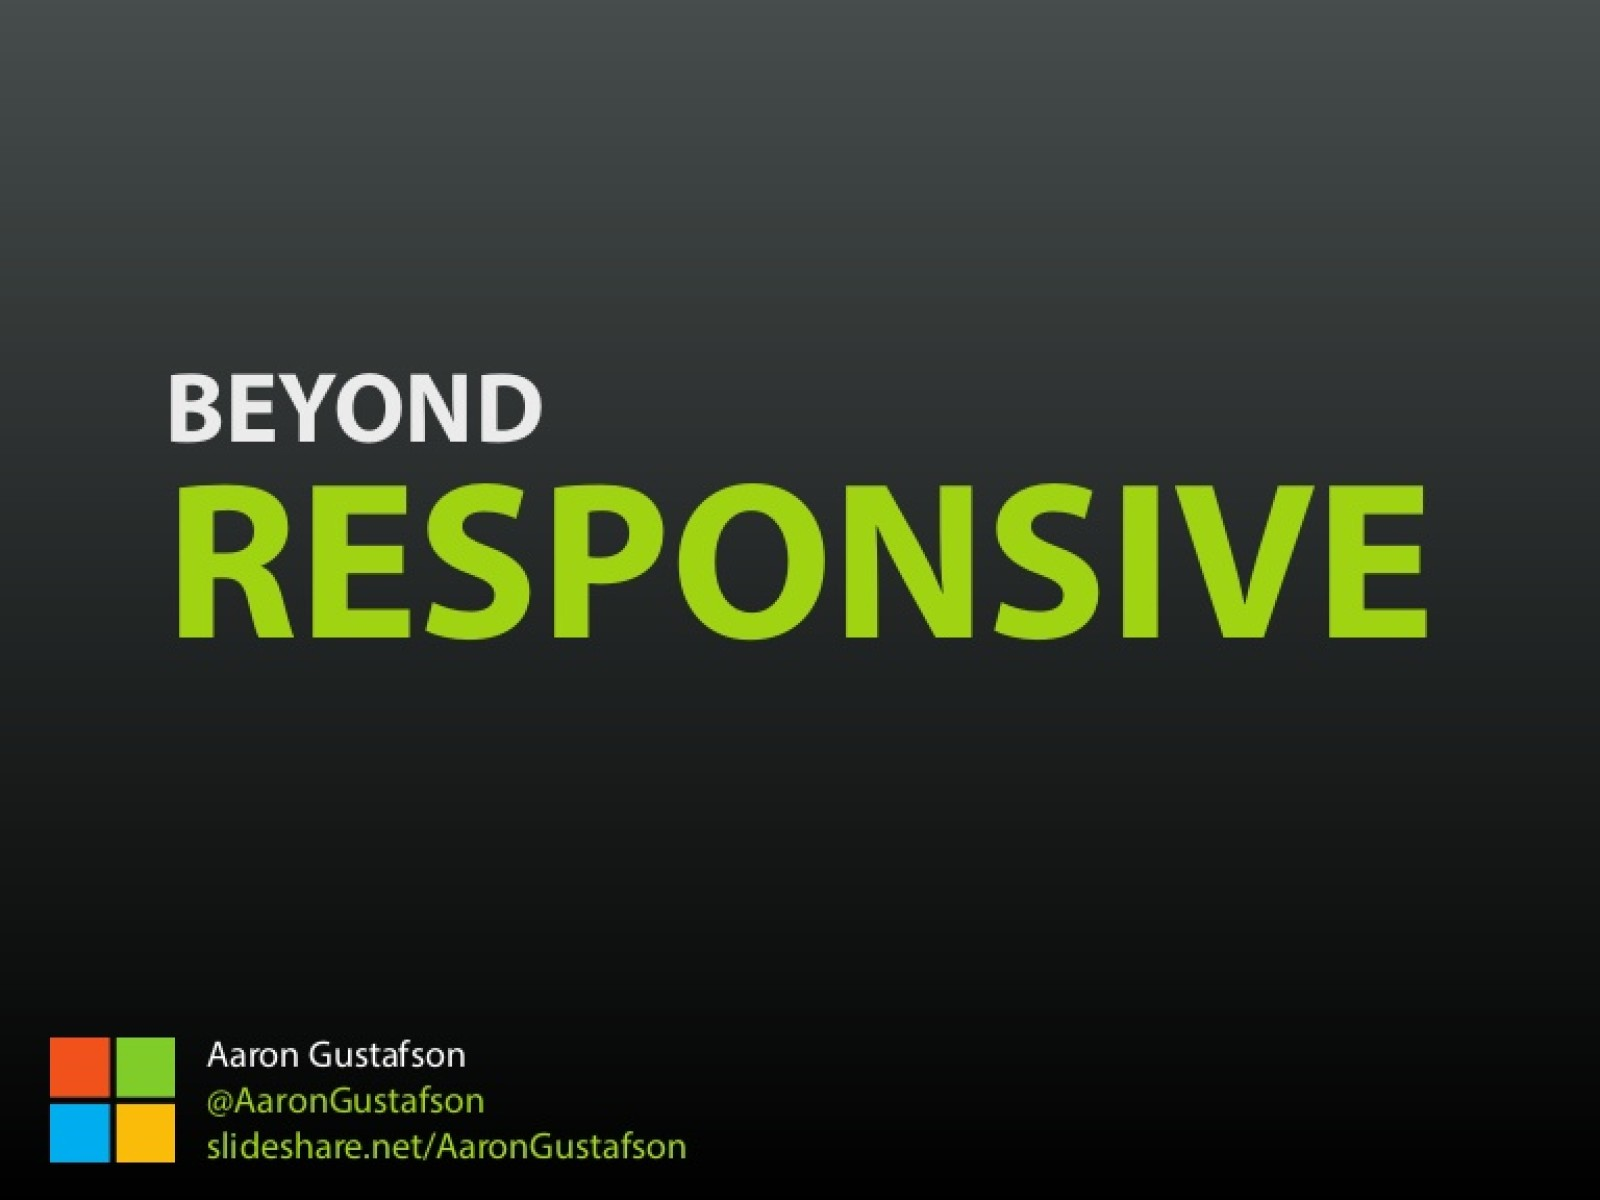 Beyond Responsive